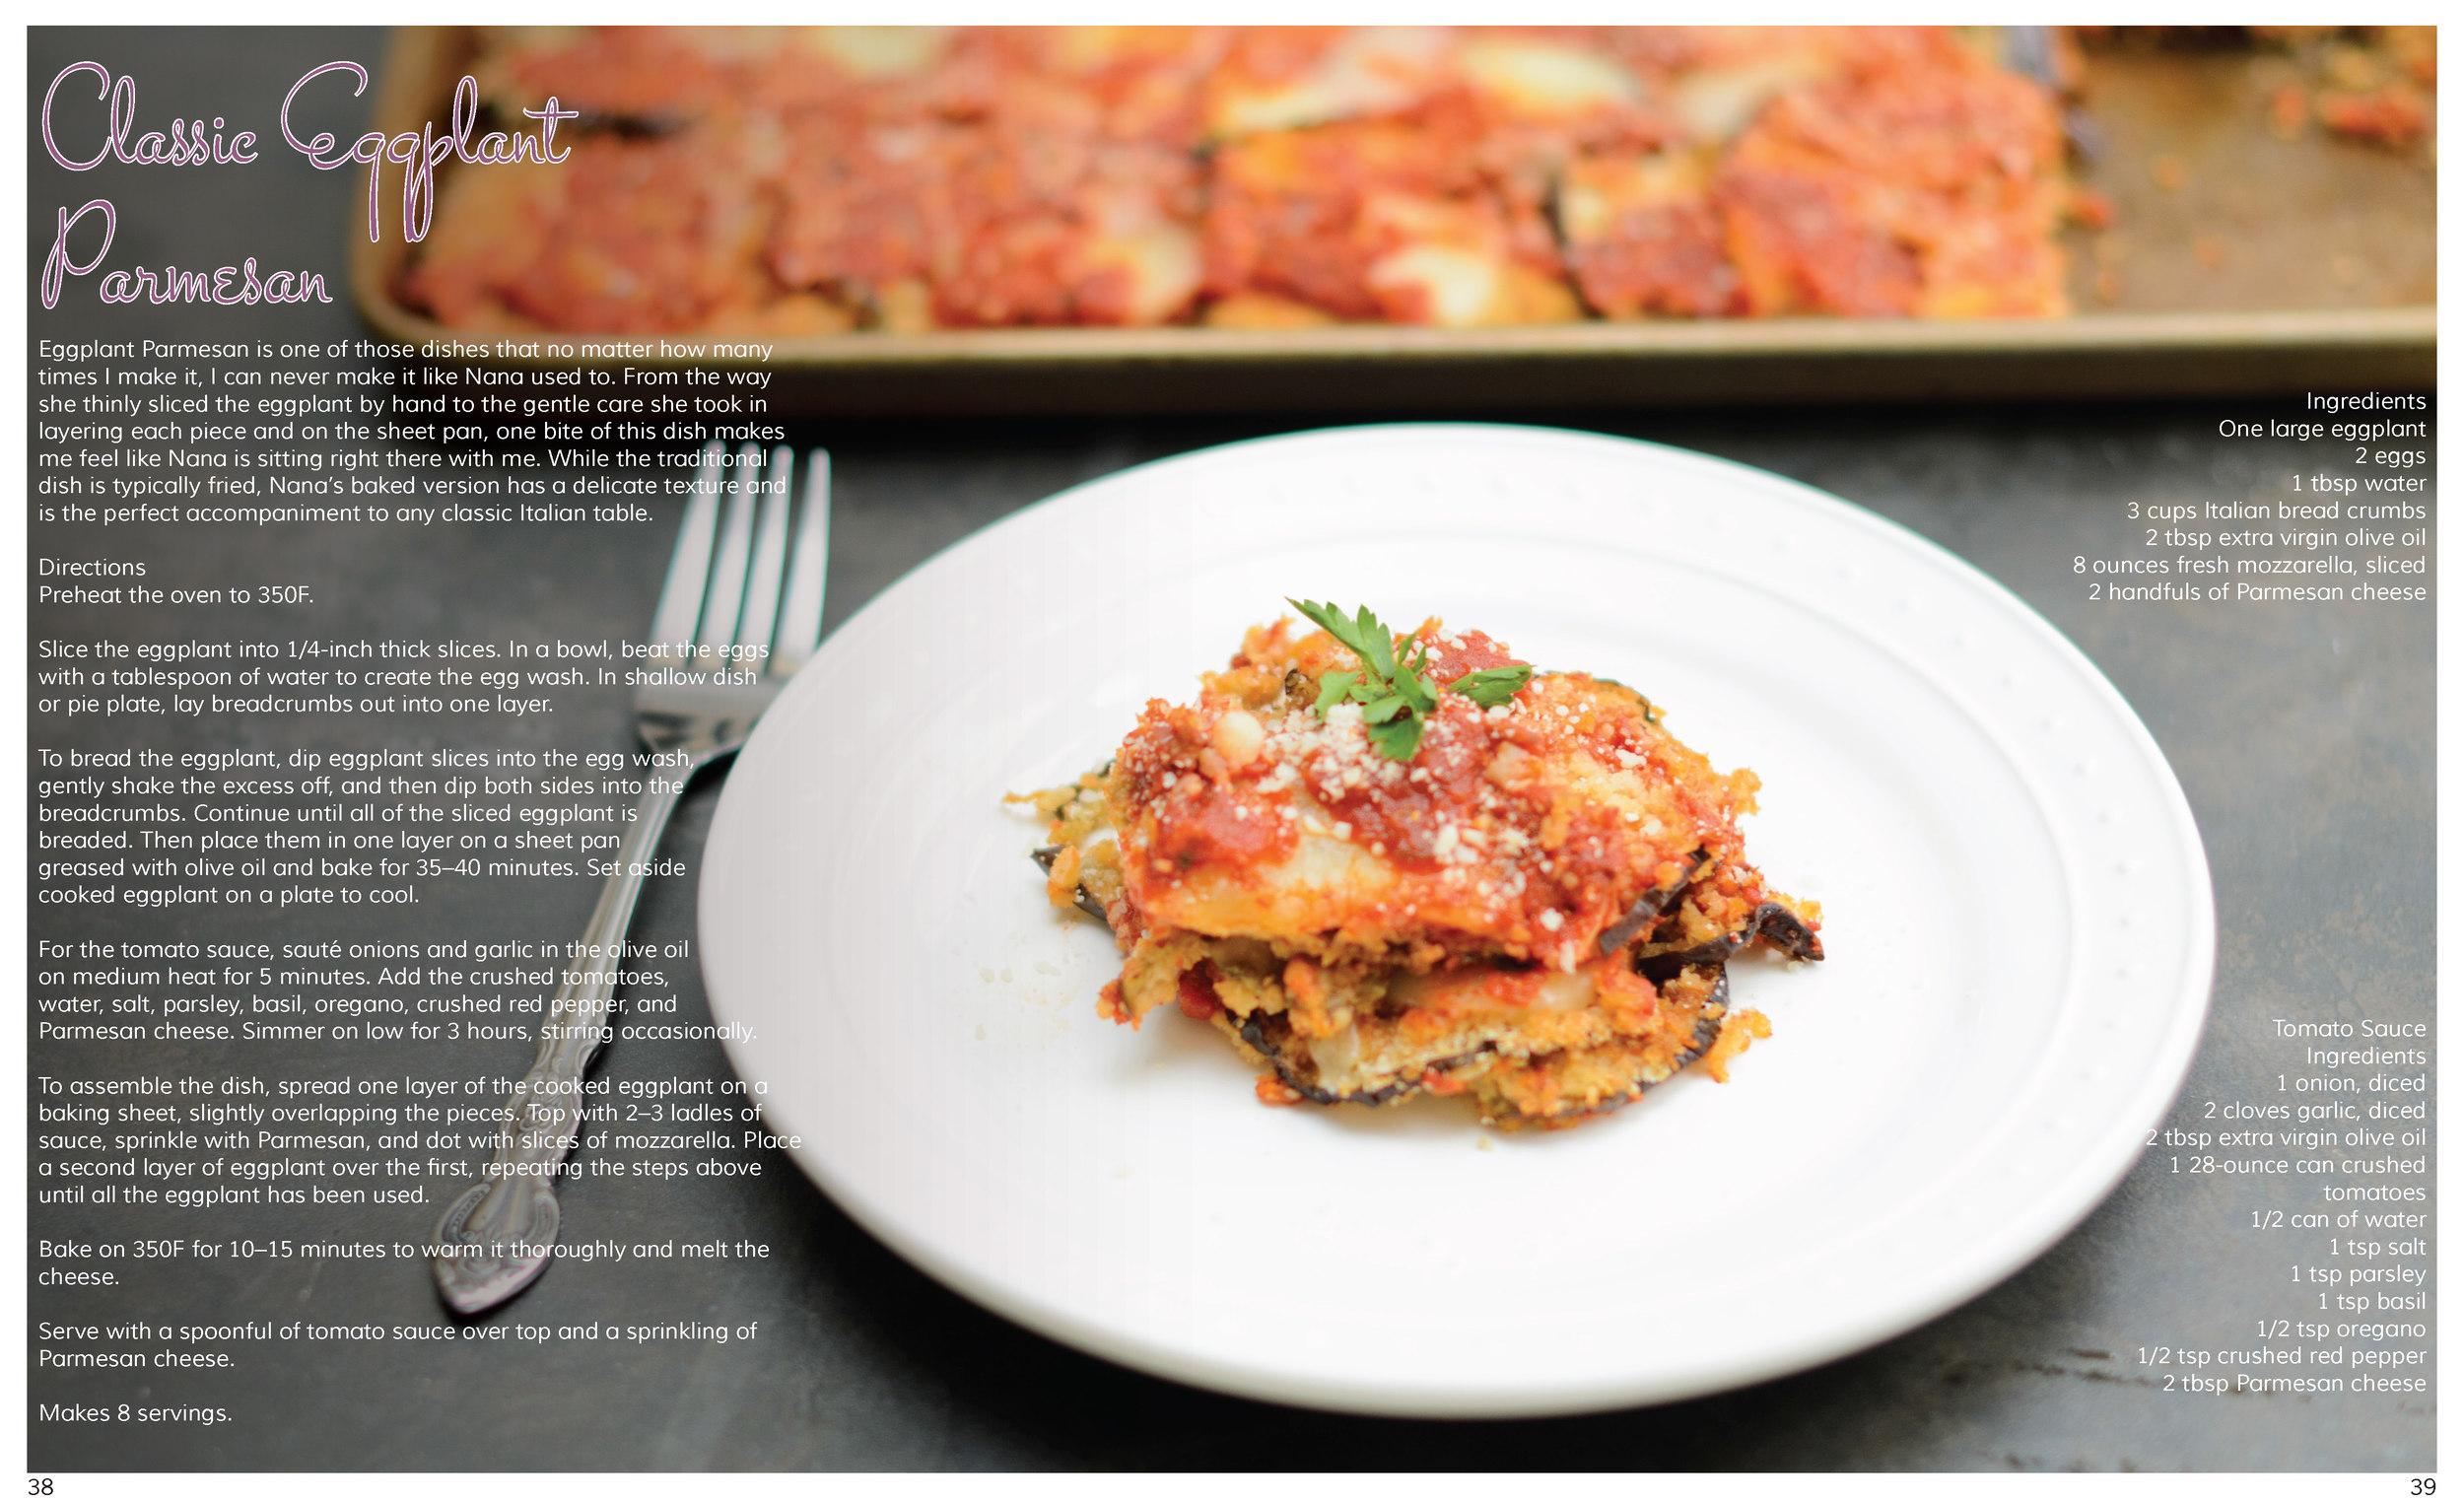 Eggplant Parmesan.jpg